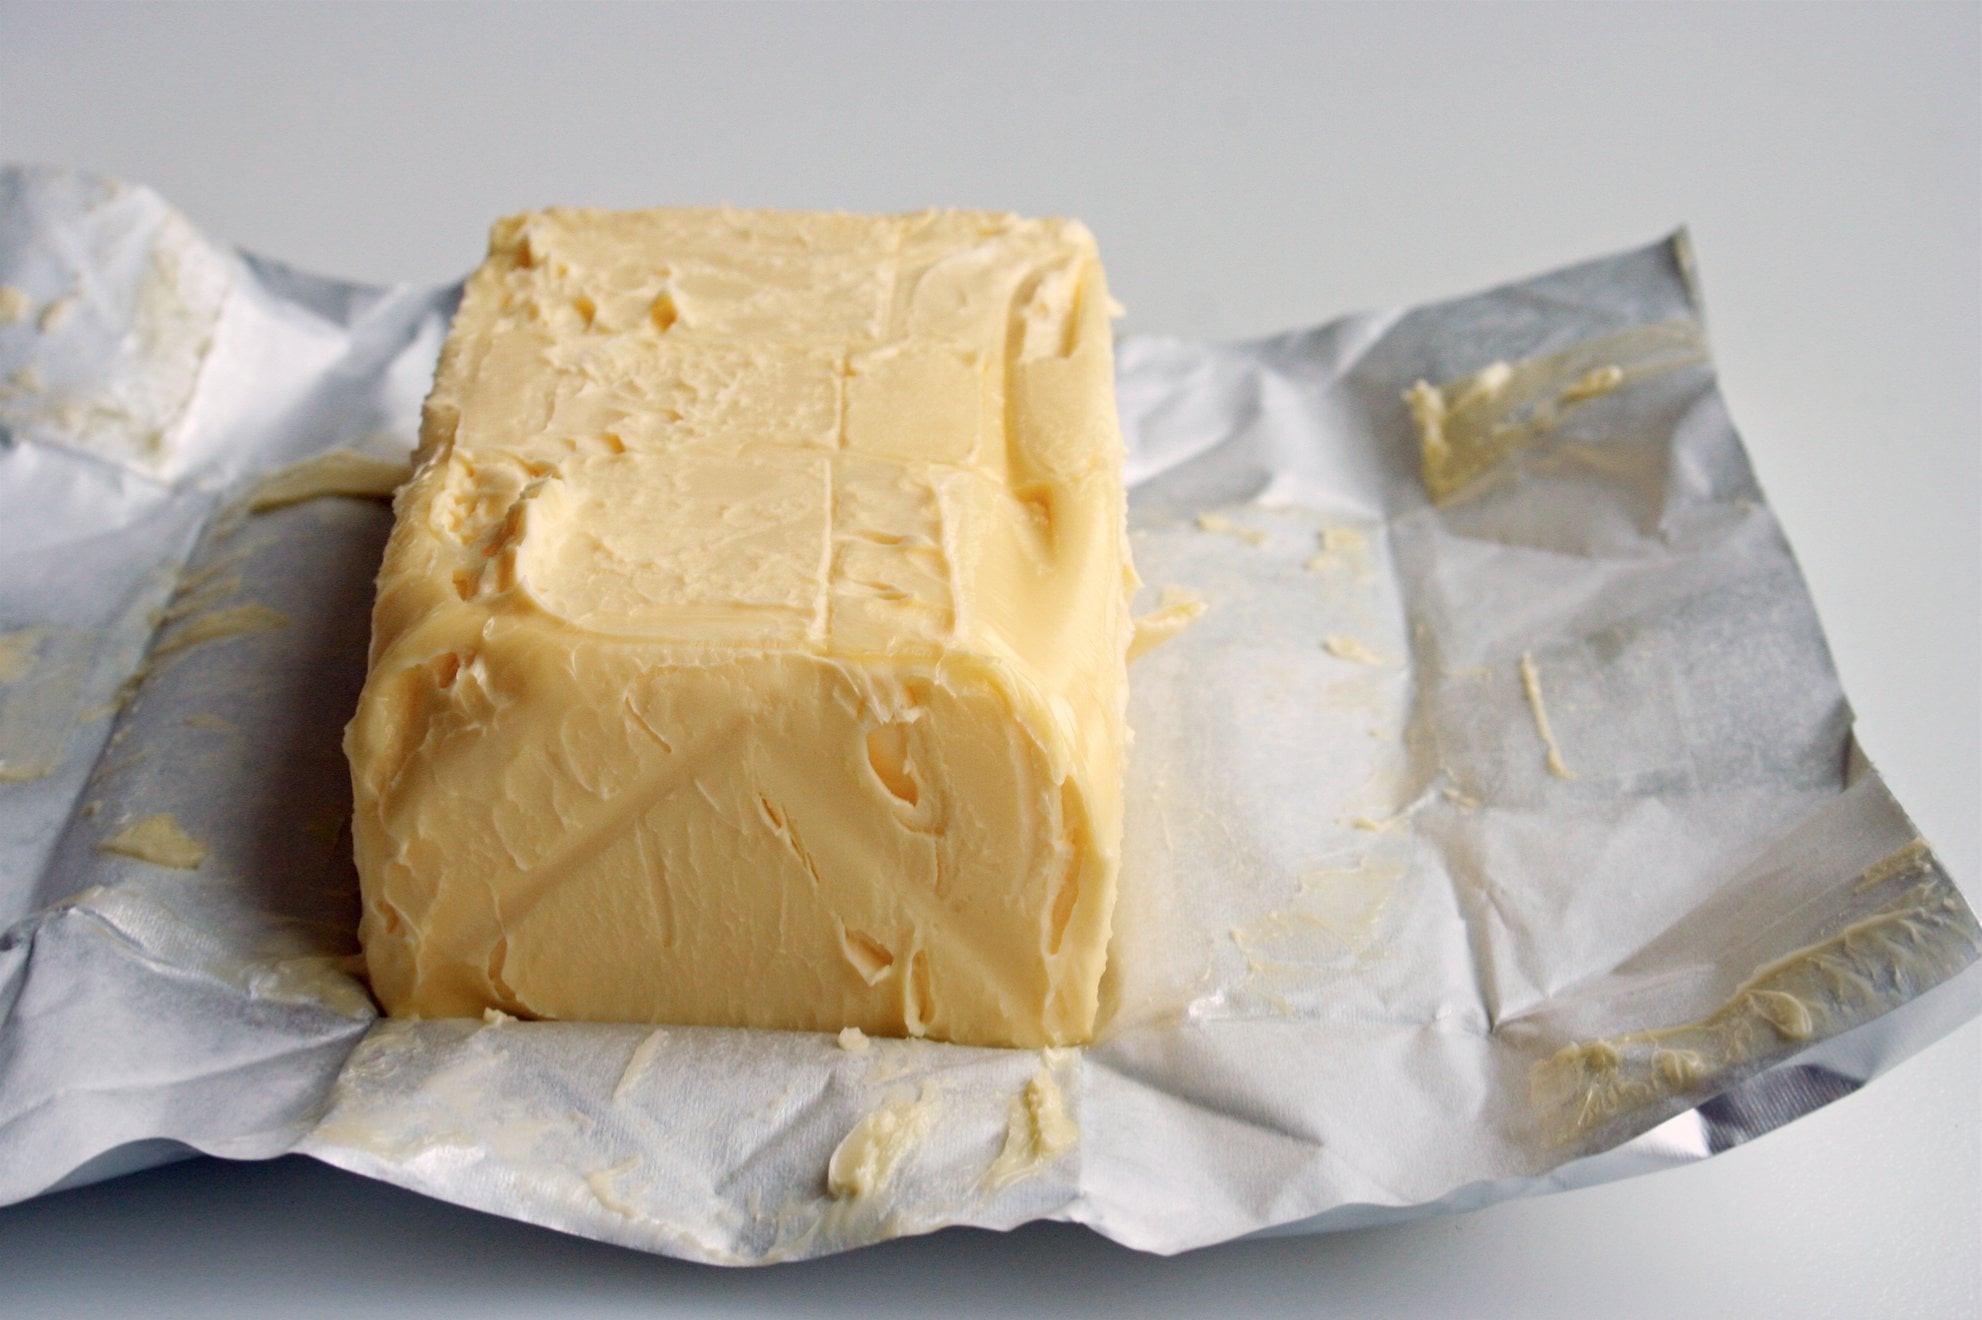 Popsugar Keto Diet  What Do You Eat on the Keto Diet